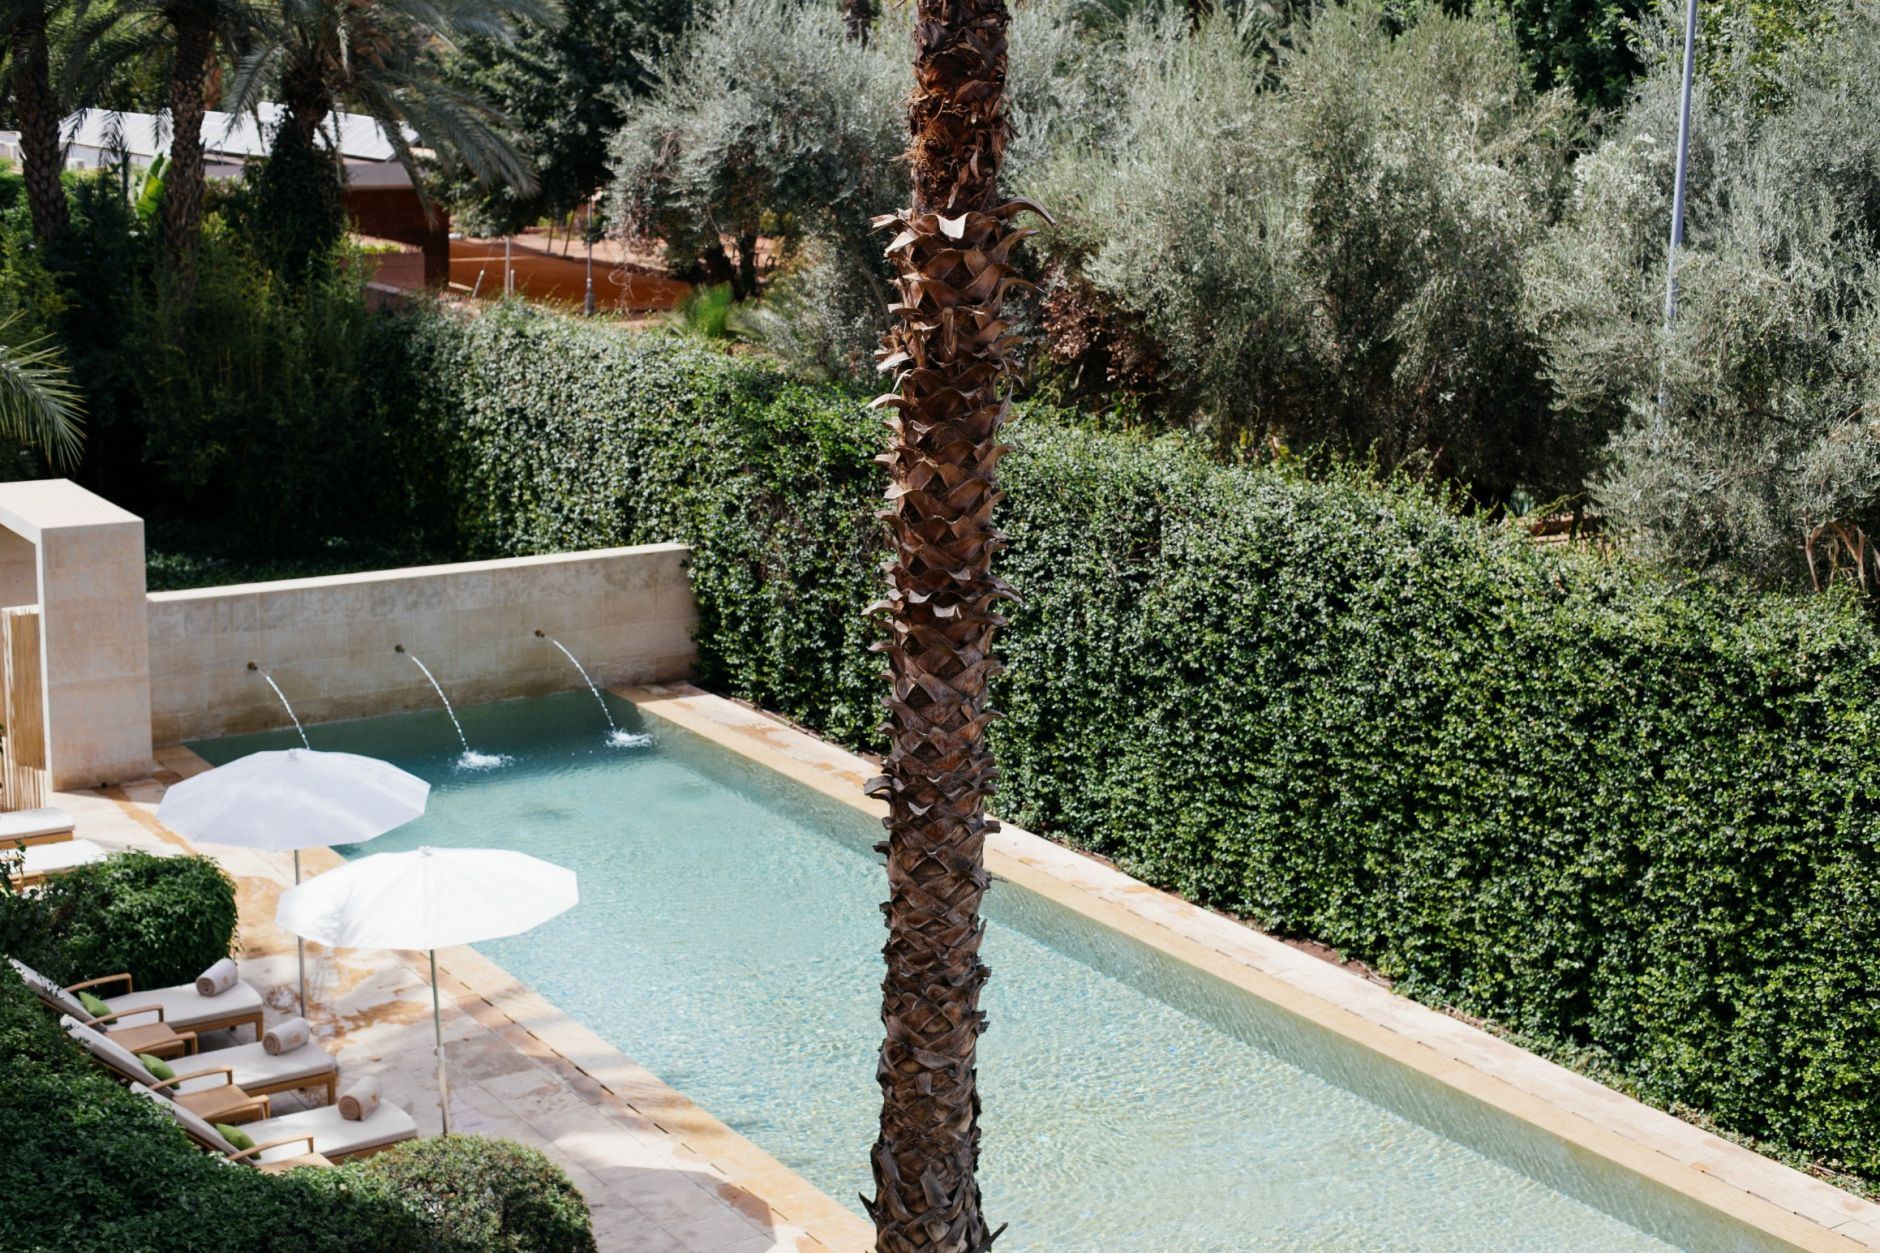 royal-mansour-hotel-luxury-marrakesch-marrakesh-morocco-edisa-shahini-disicouture-blog-9309